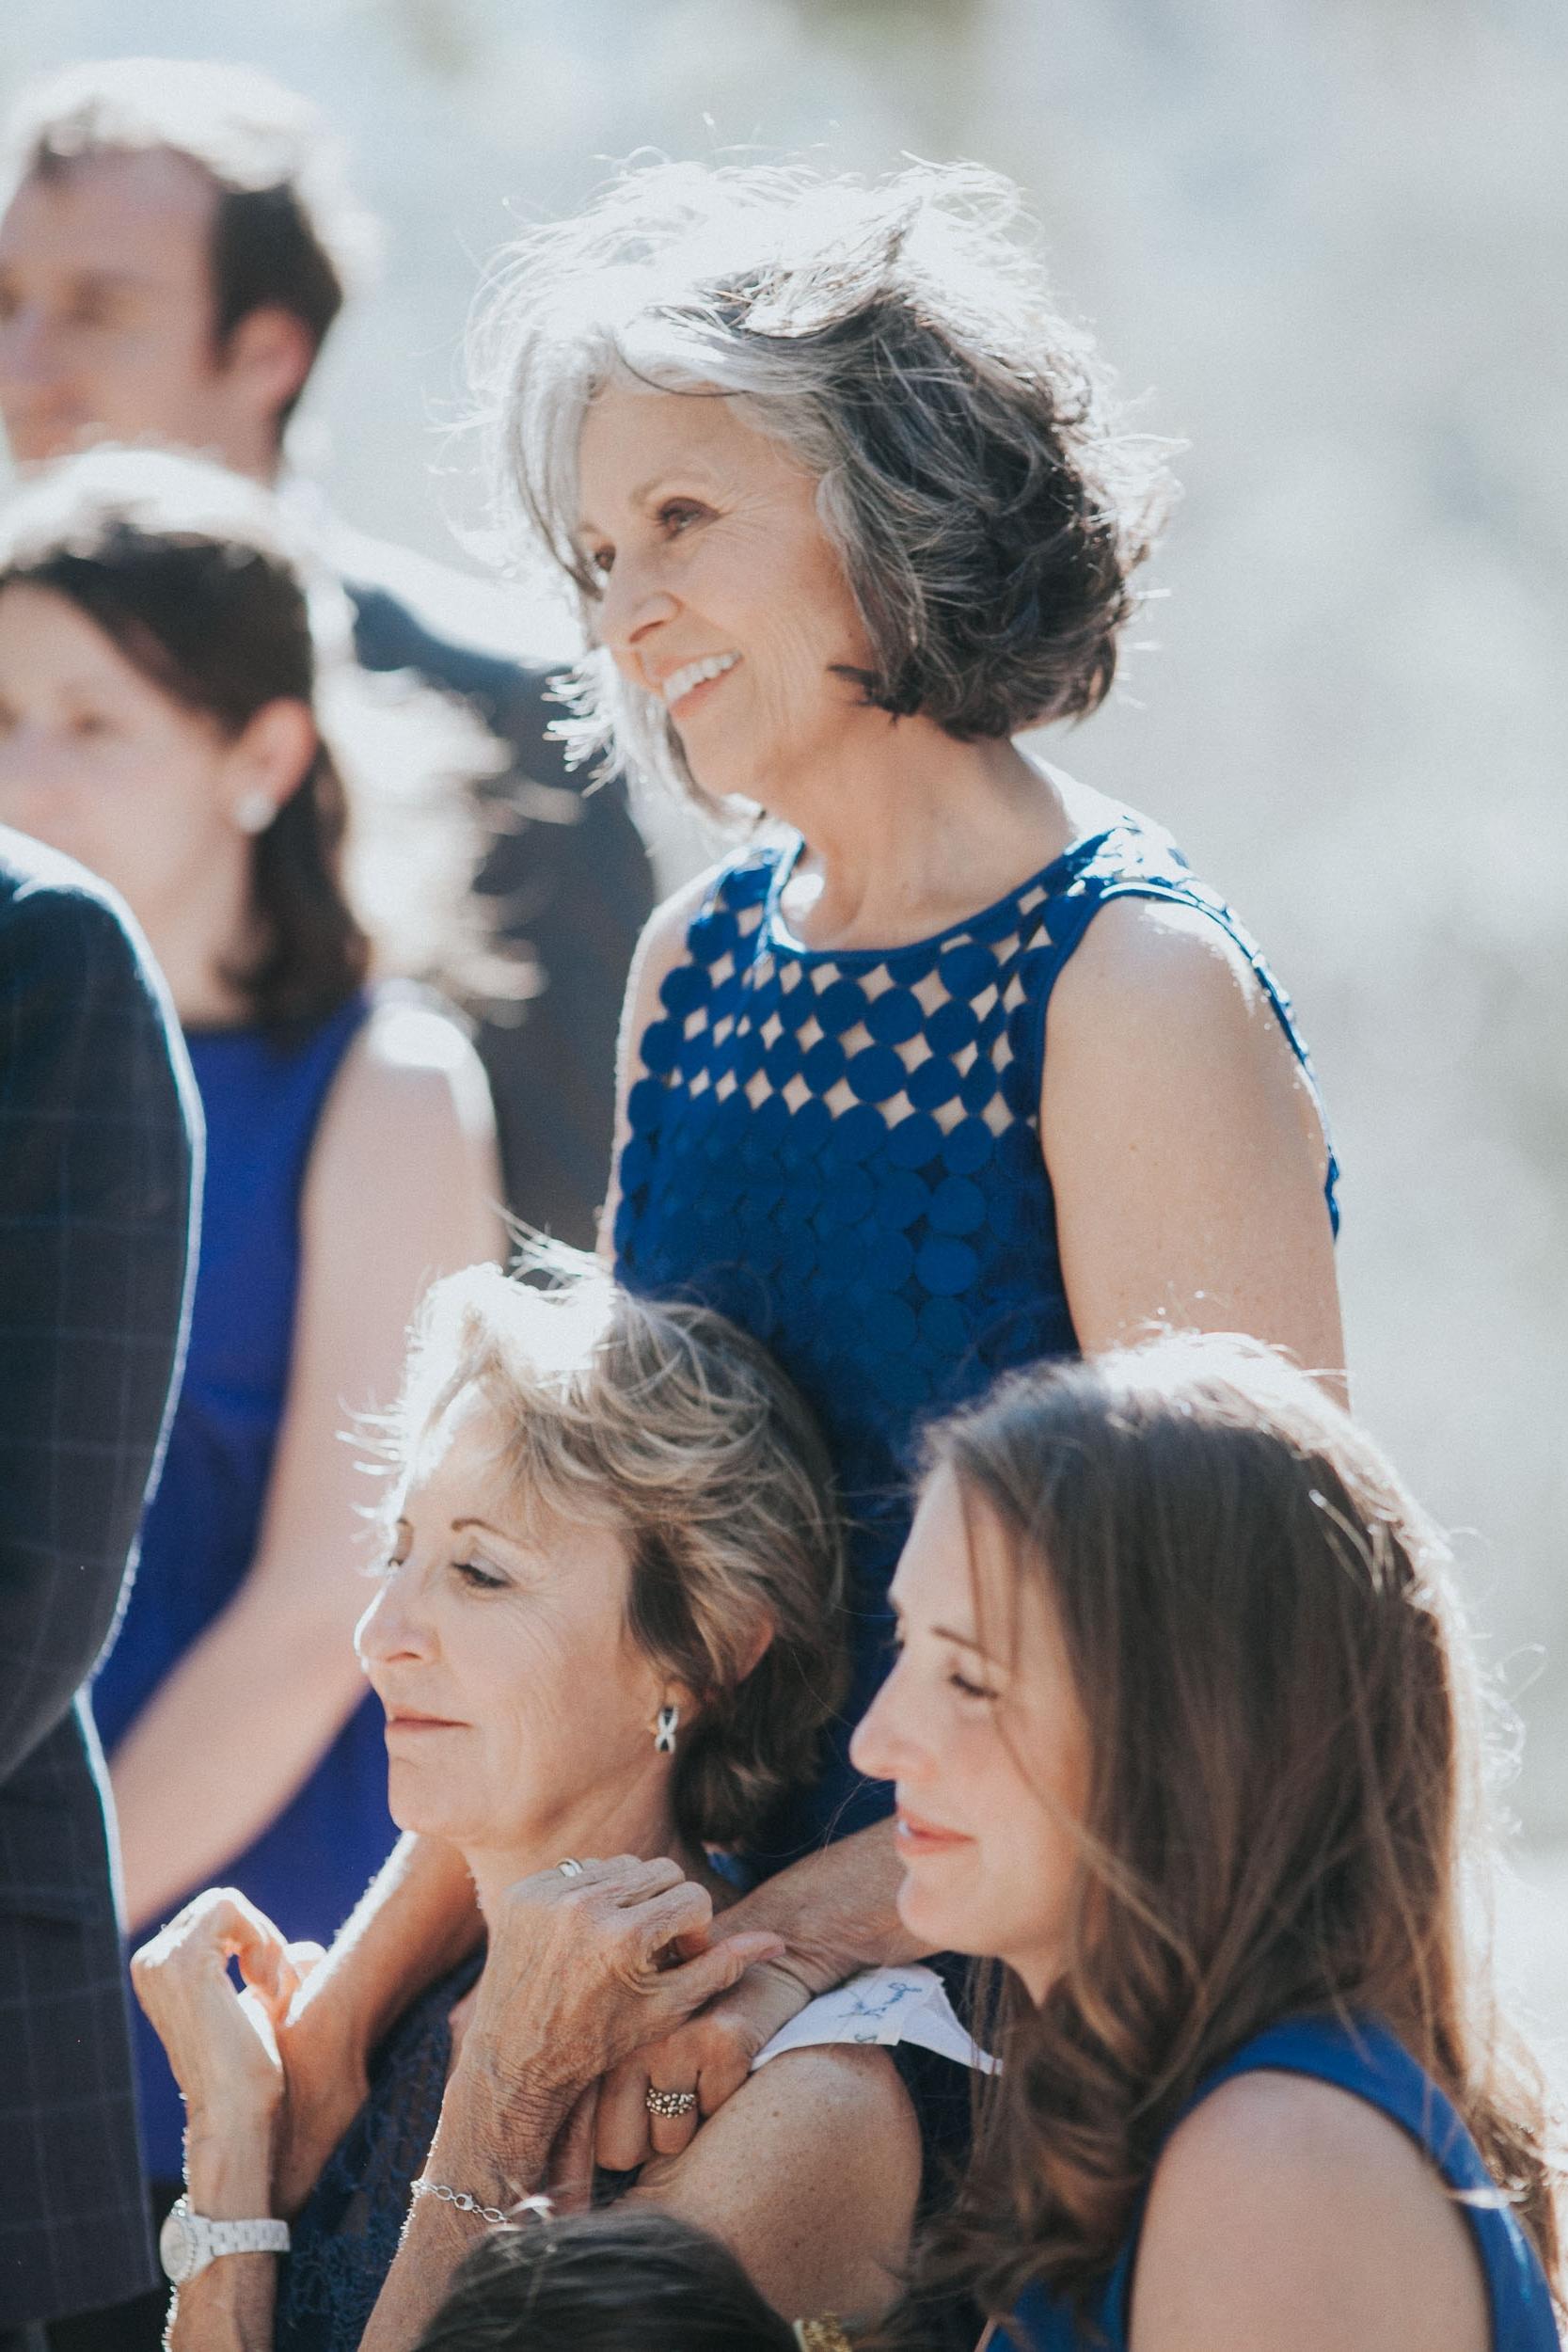 062116_C+T Carmel Wedding_Buena Lane Photography_4889.jpg